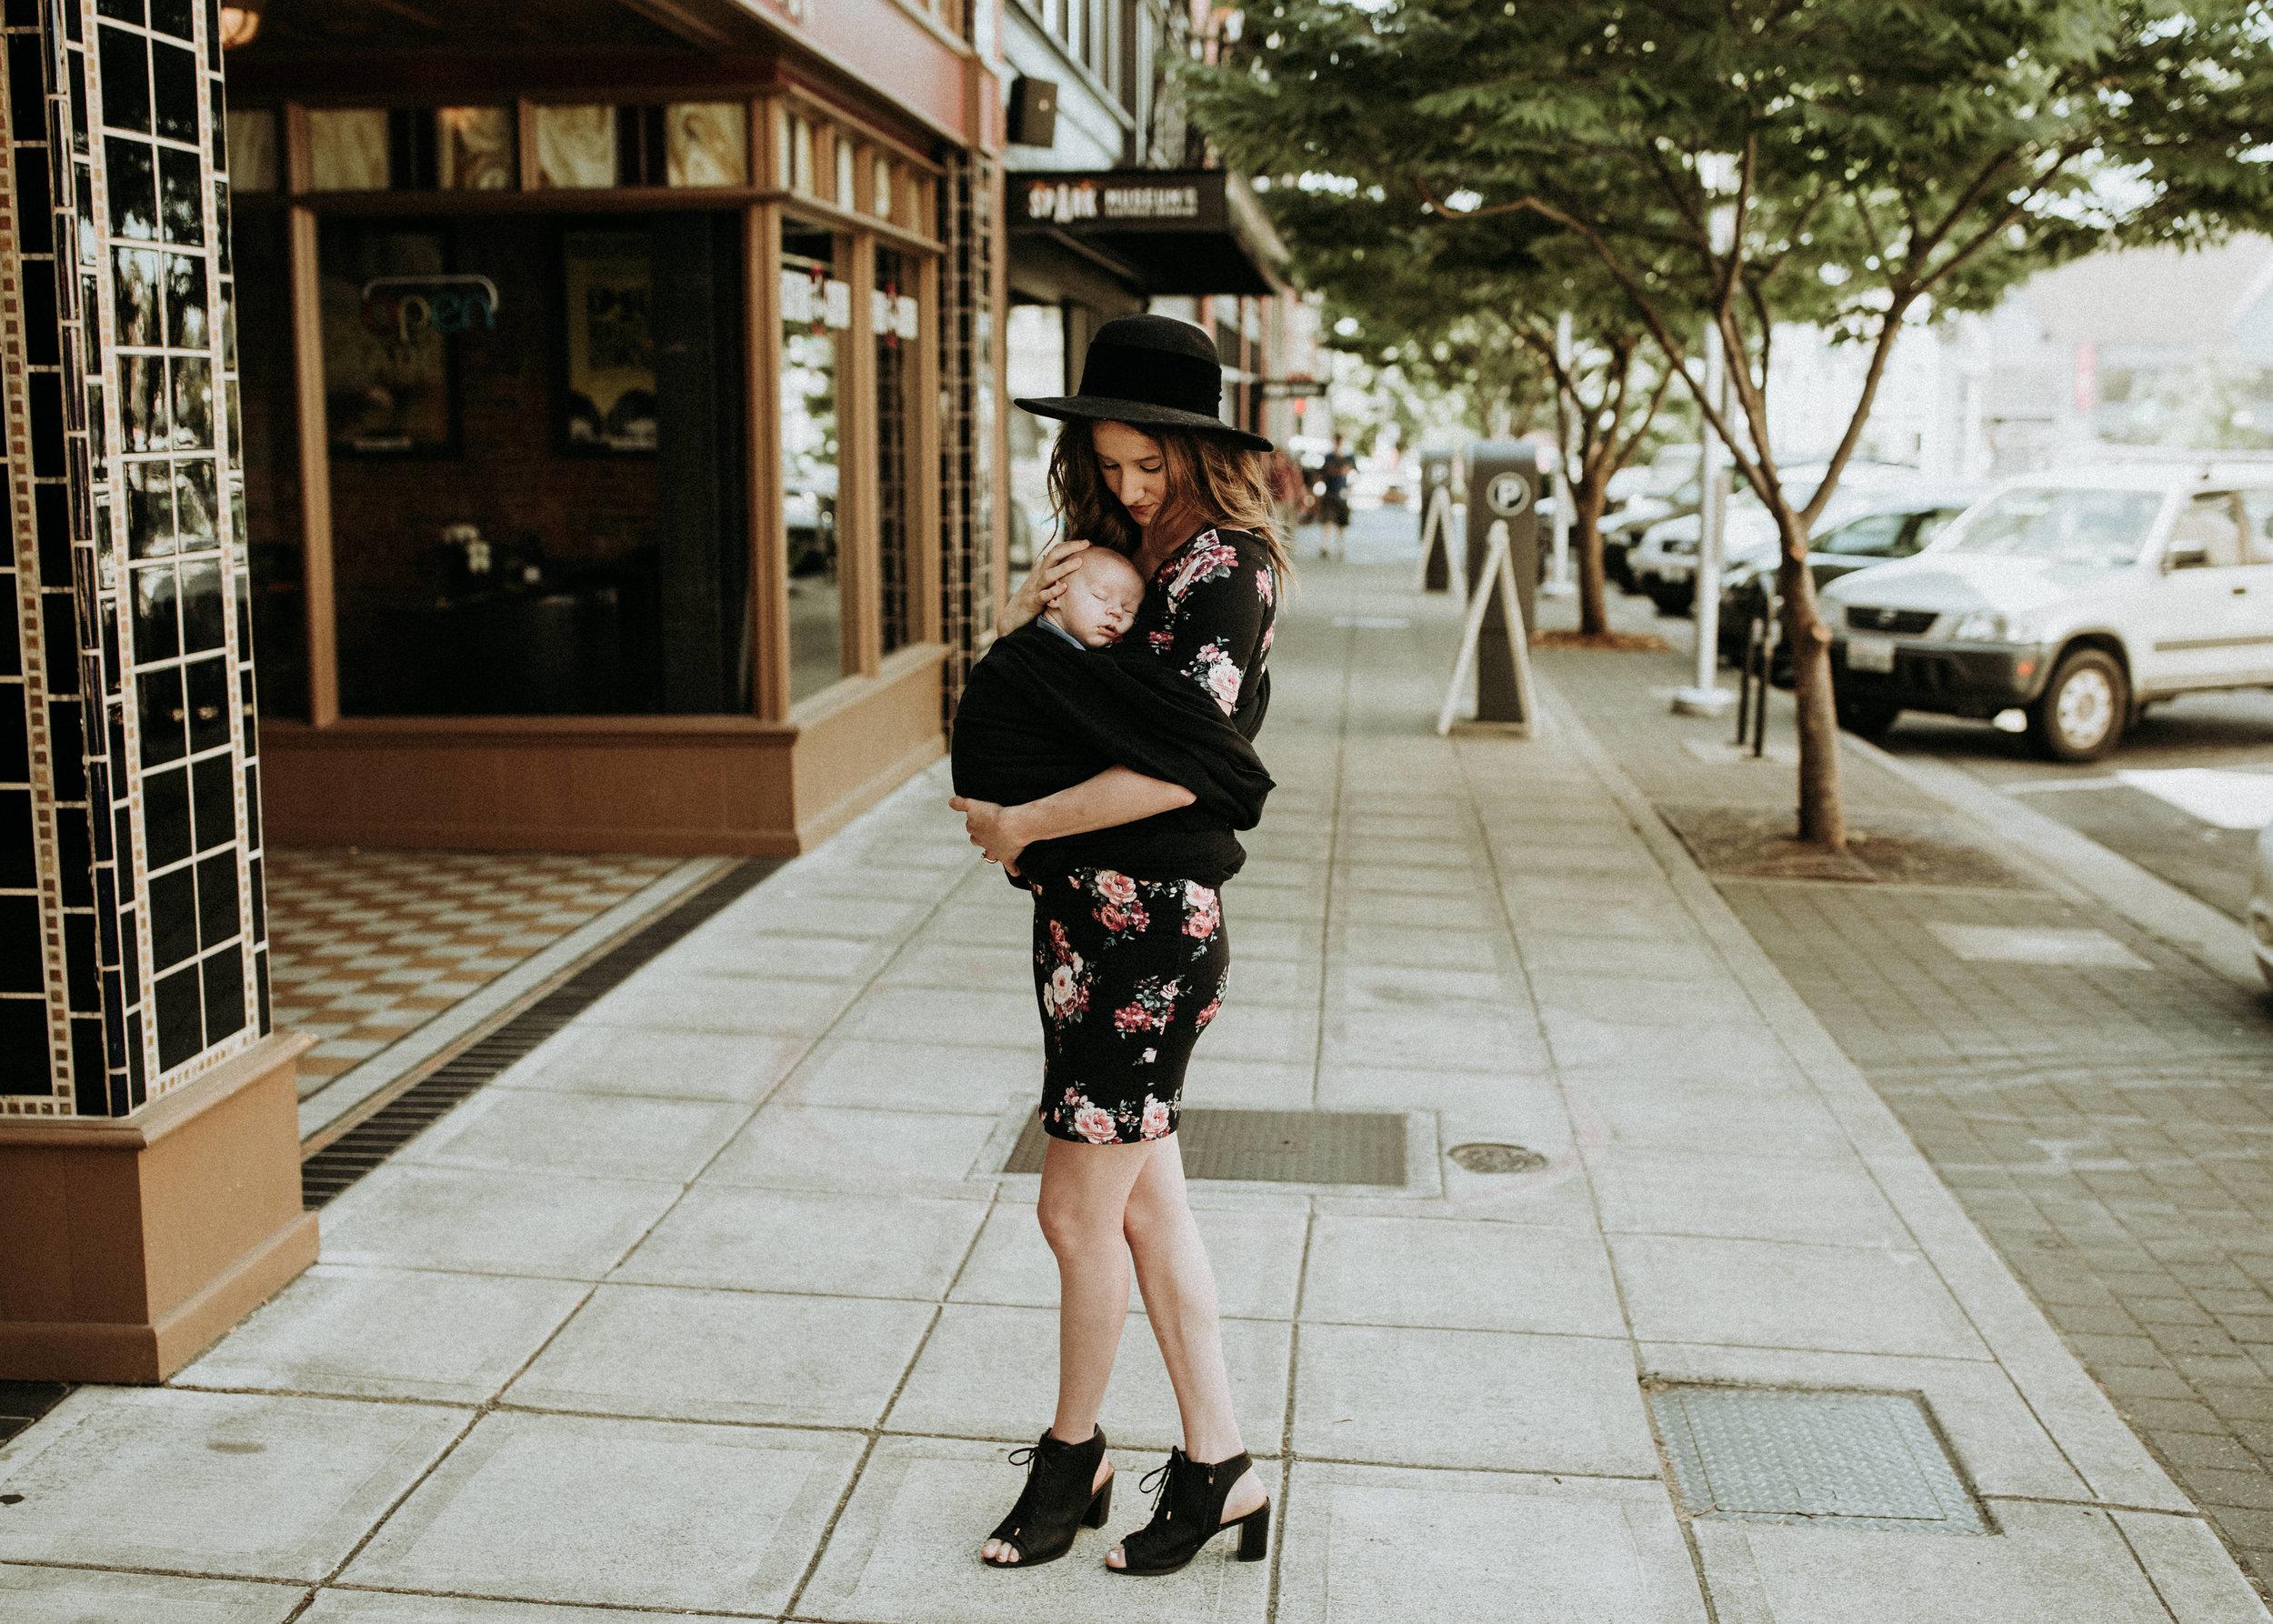 Family-Photographer-Bellingham-WA-Brianne-Bell-Photography-(Jessica)-40.jpg